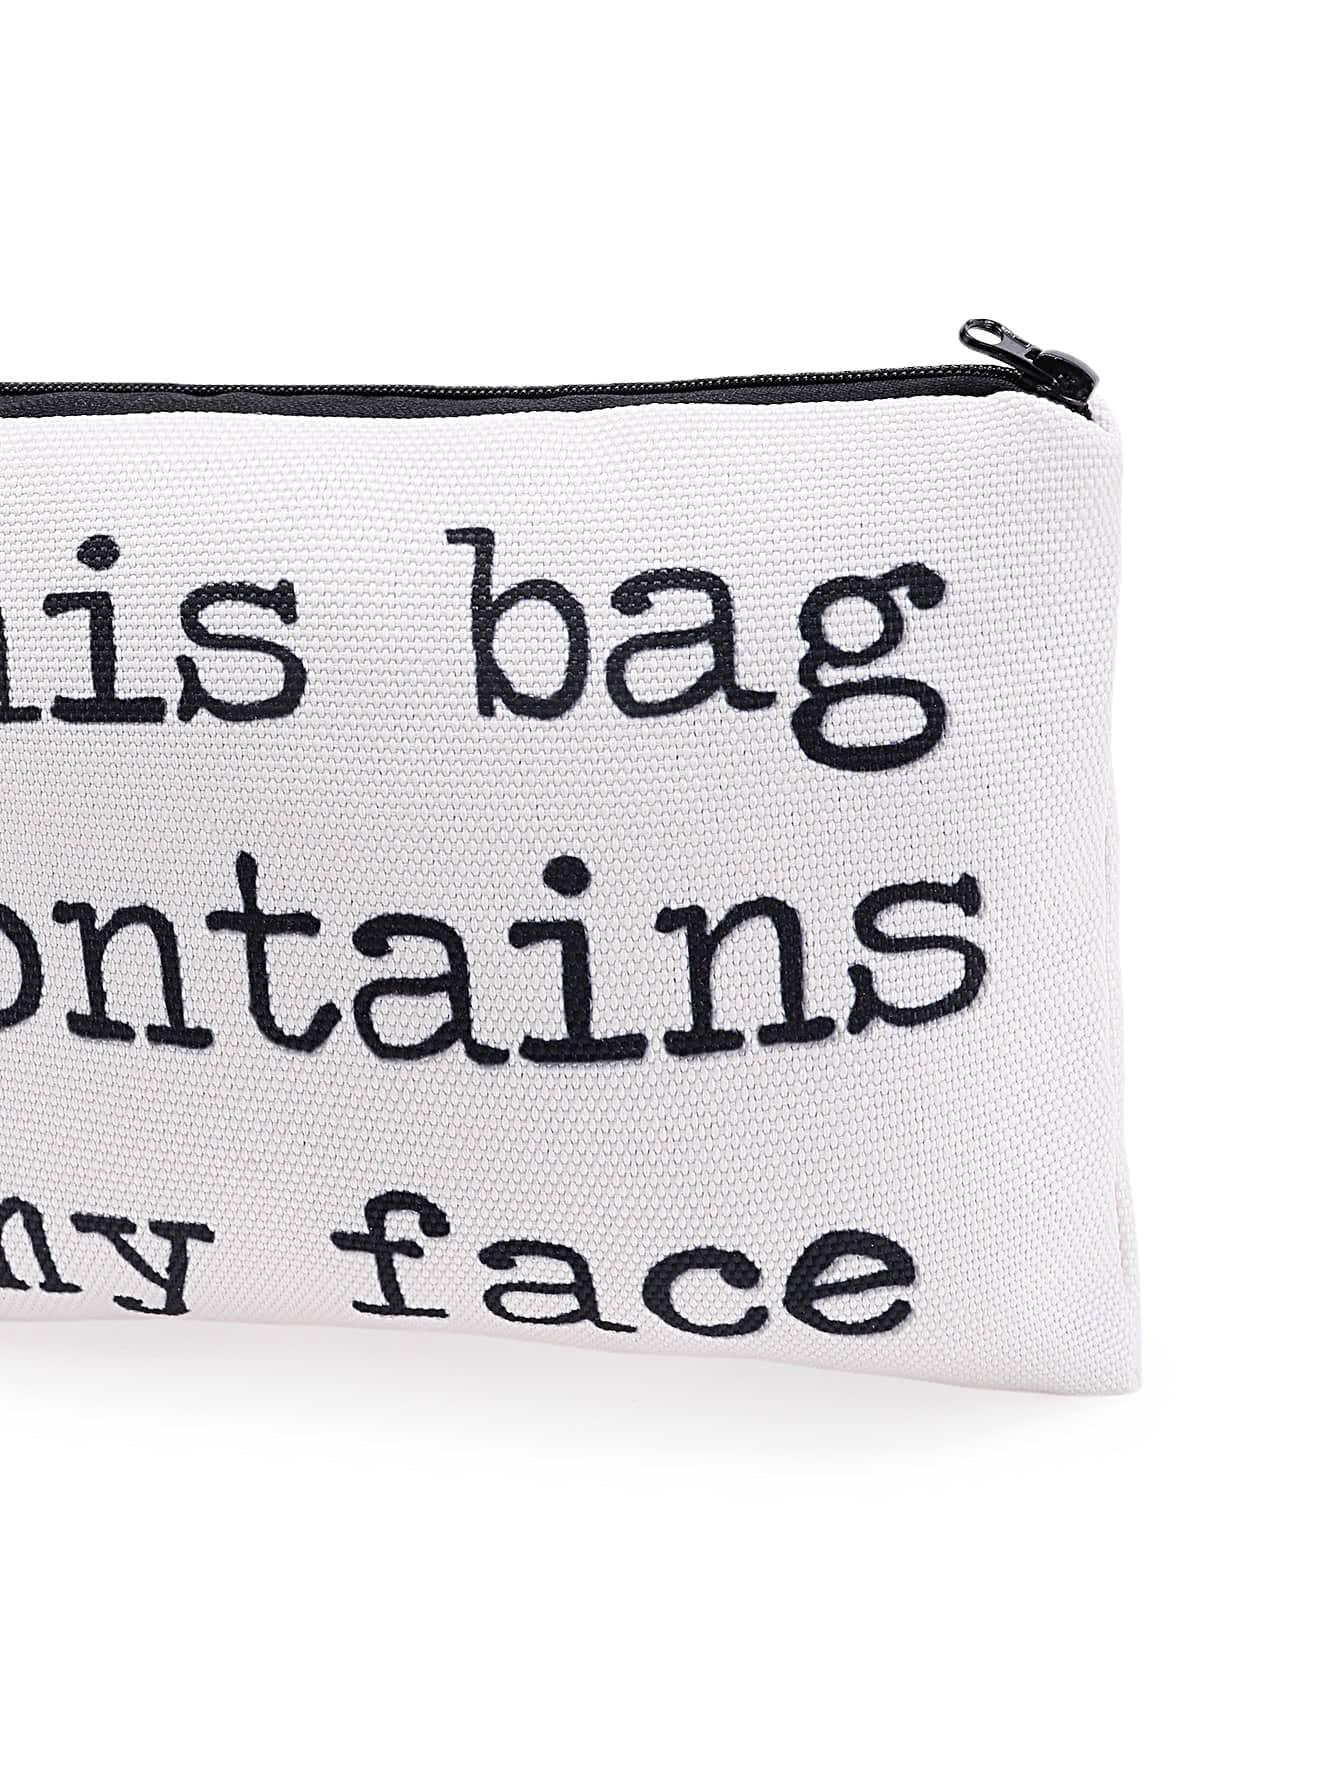 Slogan Print Zipper Cosmetic Bag